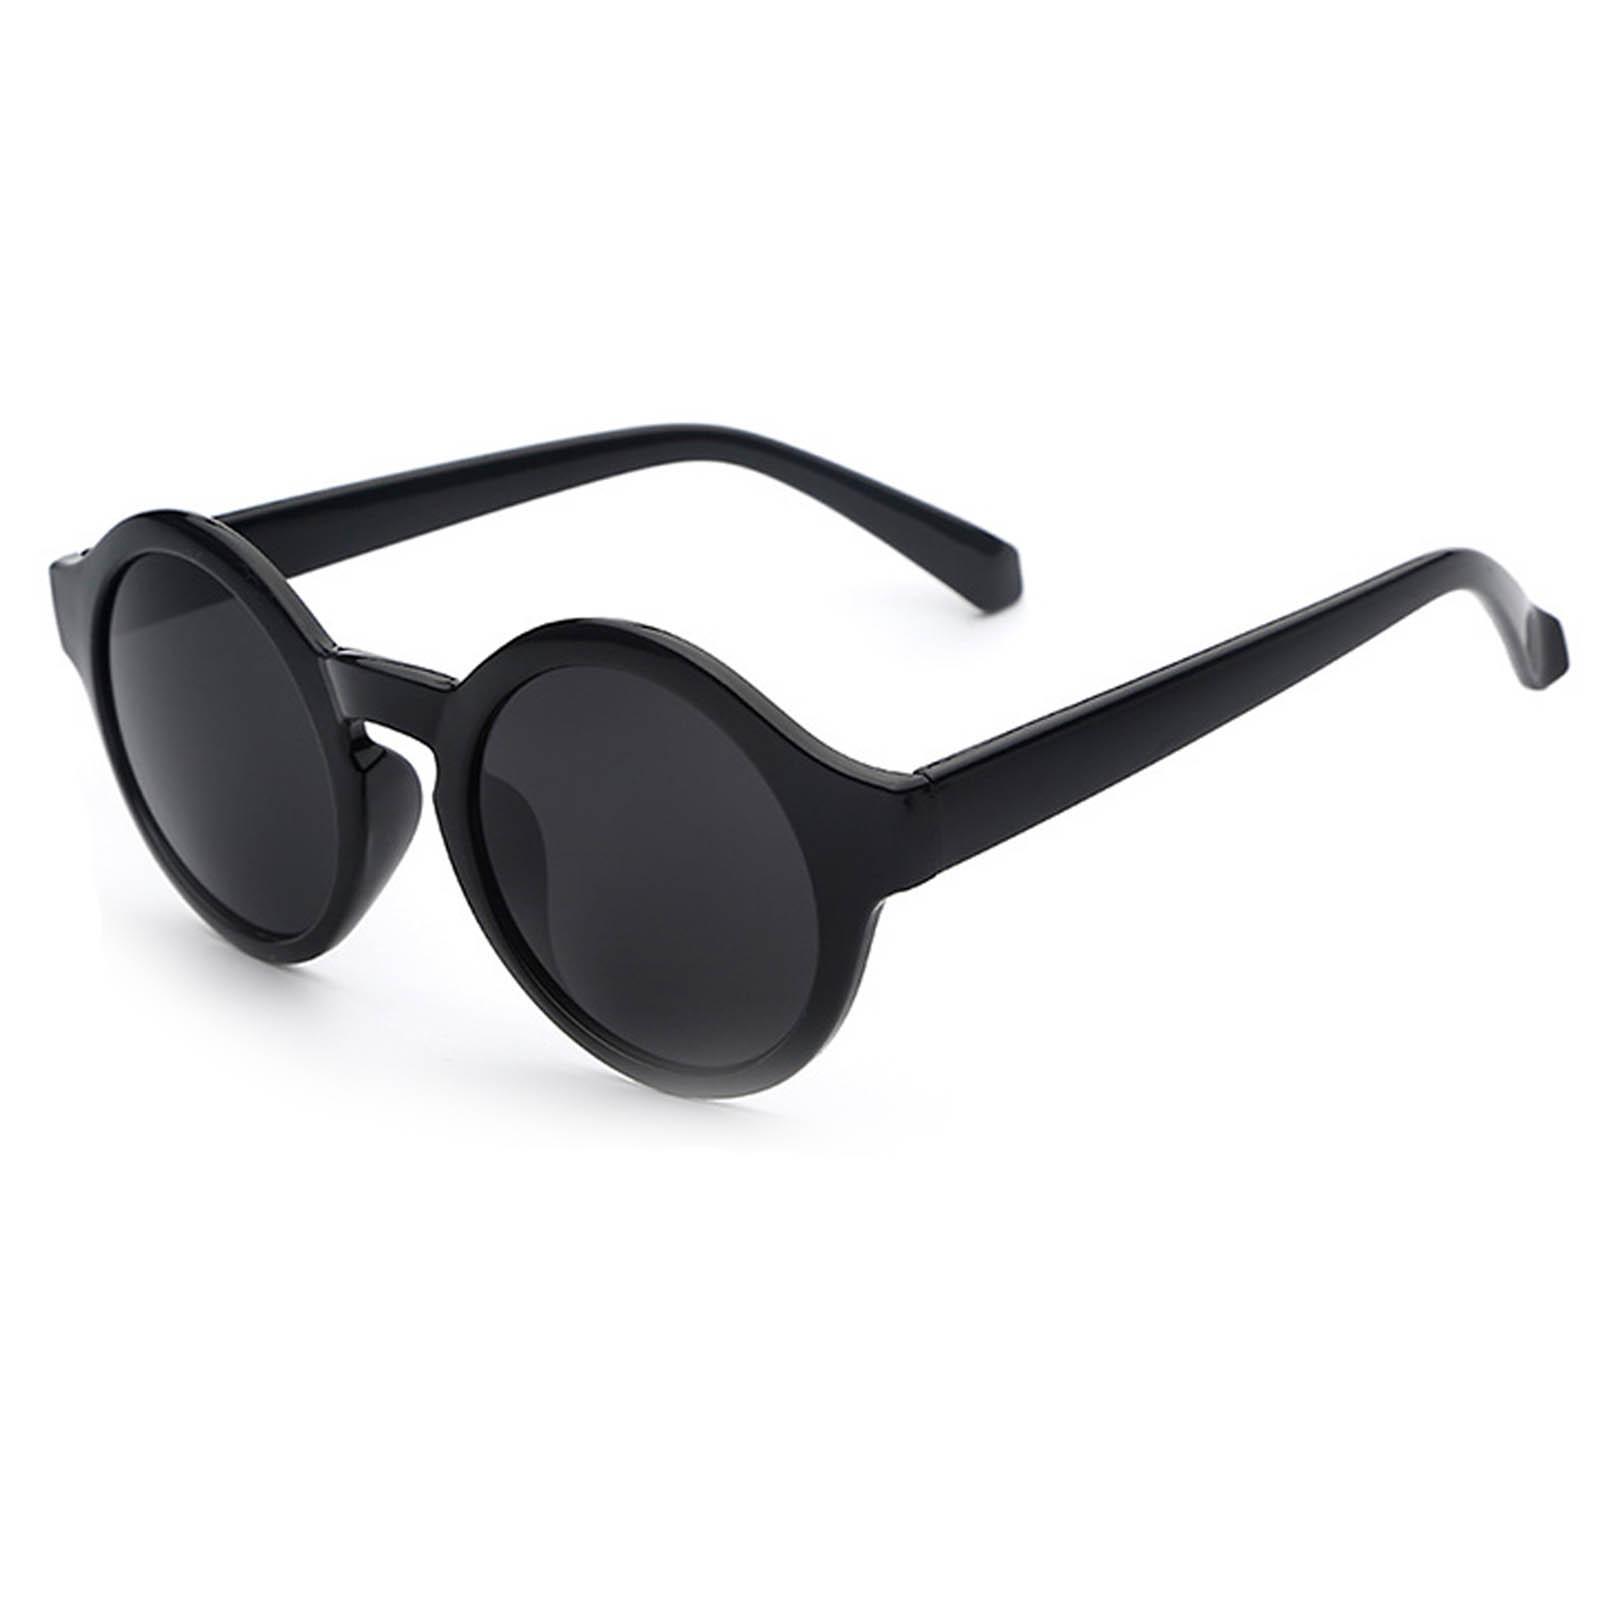 OWL ® 010 C1 Round Eyewear Sunglasses Women's Men's Plastic Round Circle Black Frame BlackLens One Pair